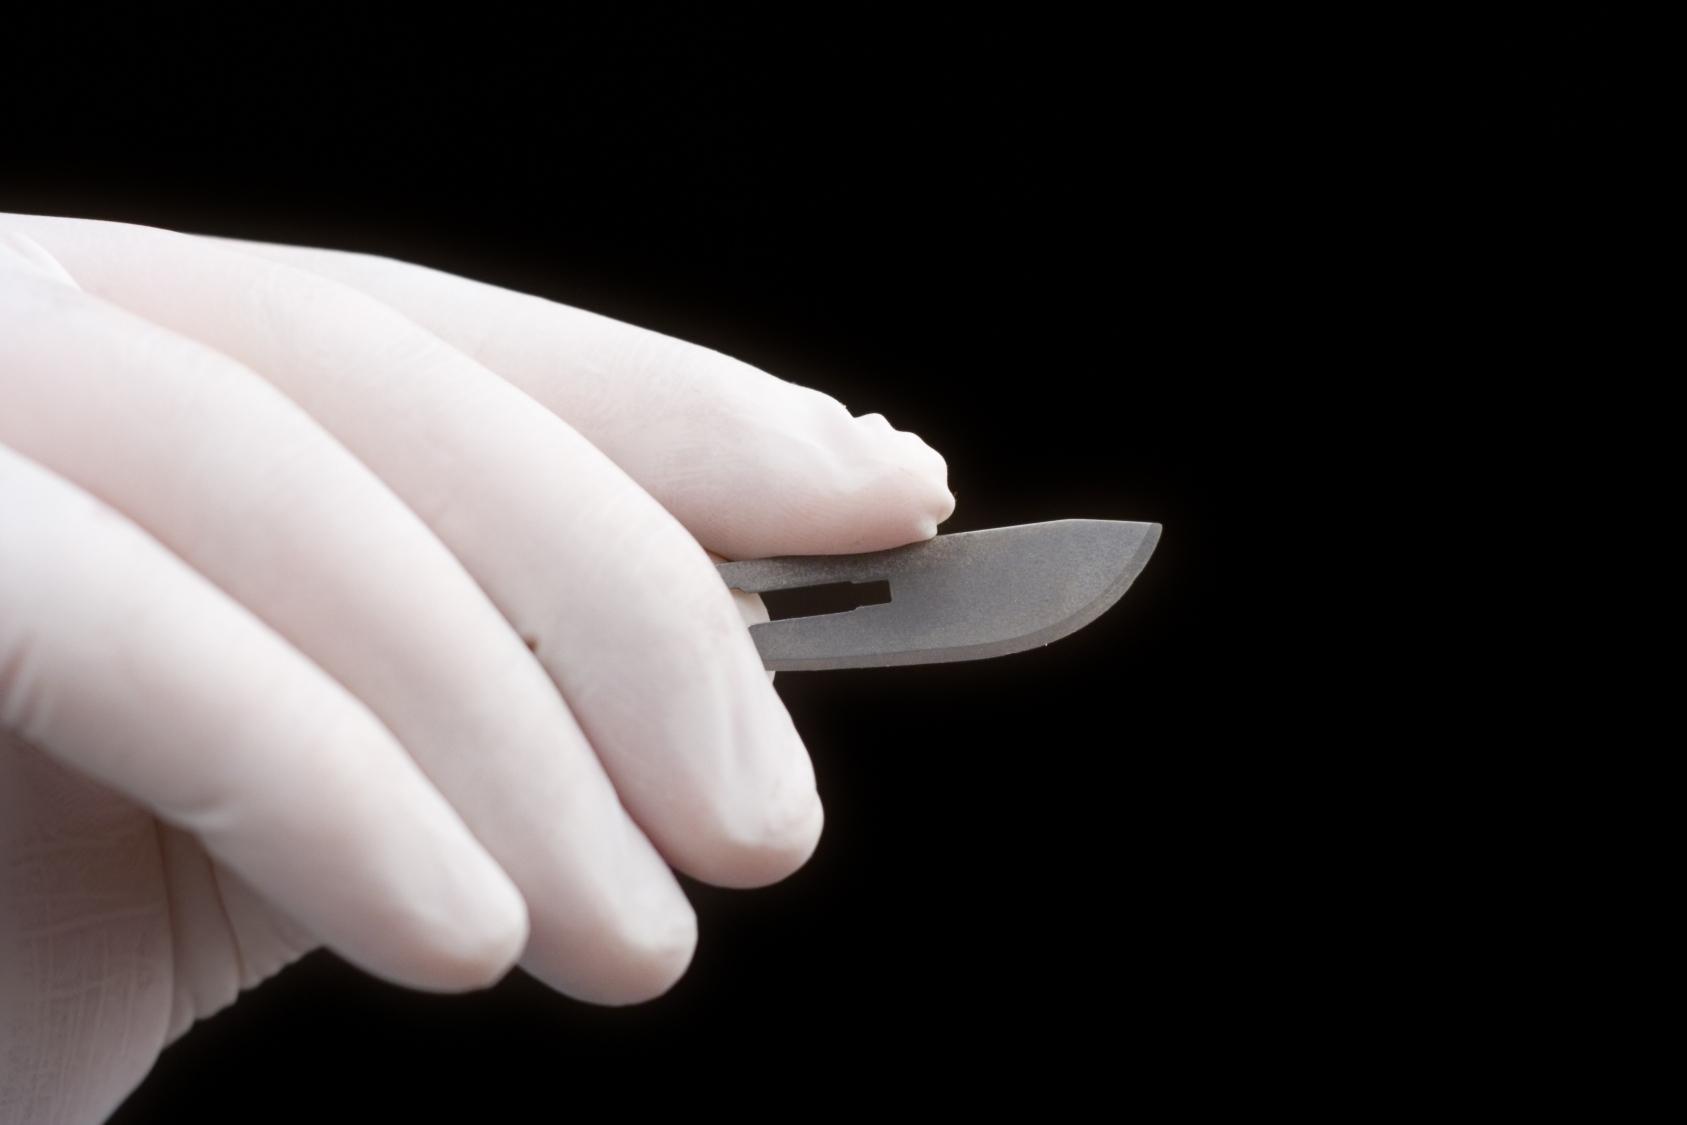 Under the knife: The ethics of anatomy – The Express Tribune Blog